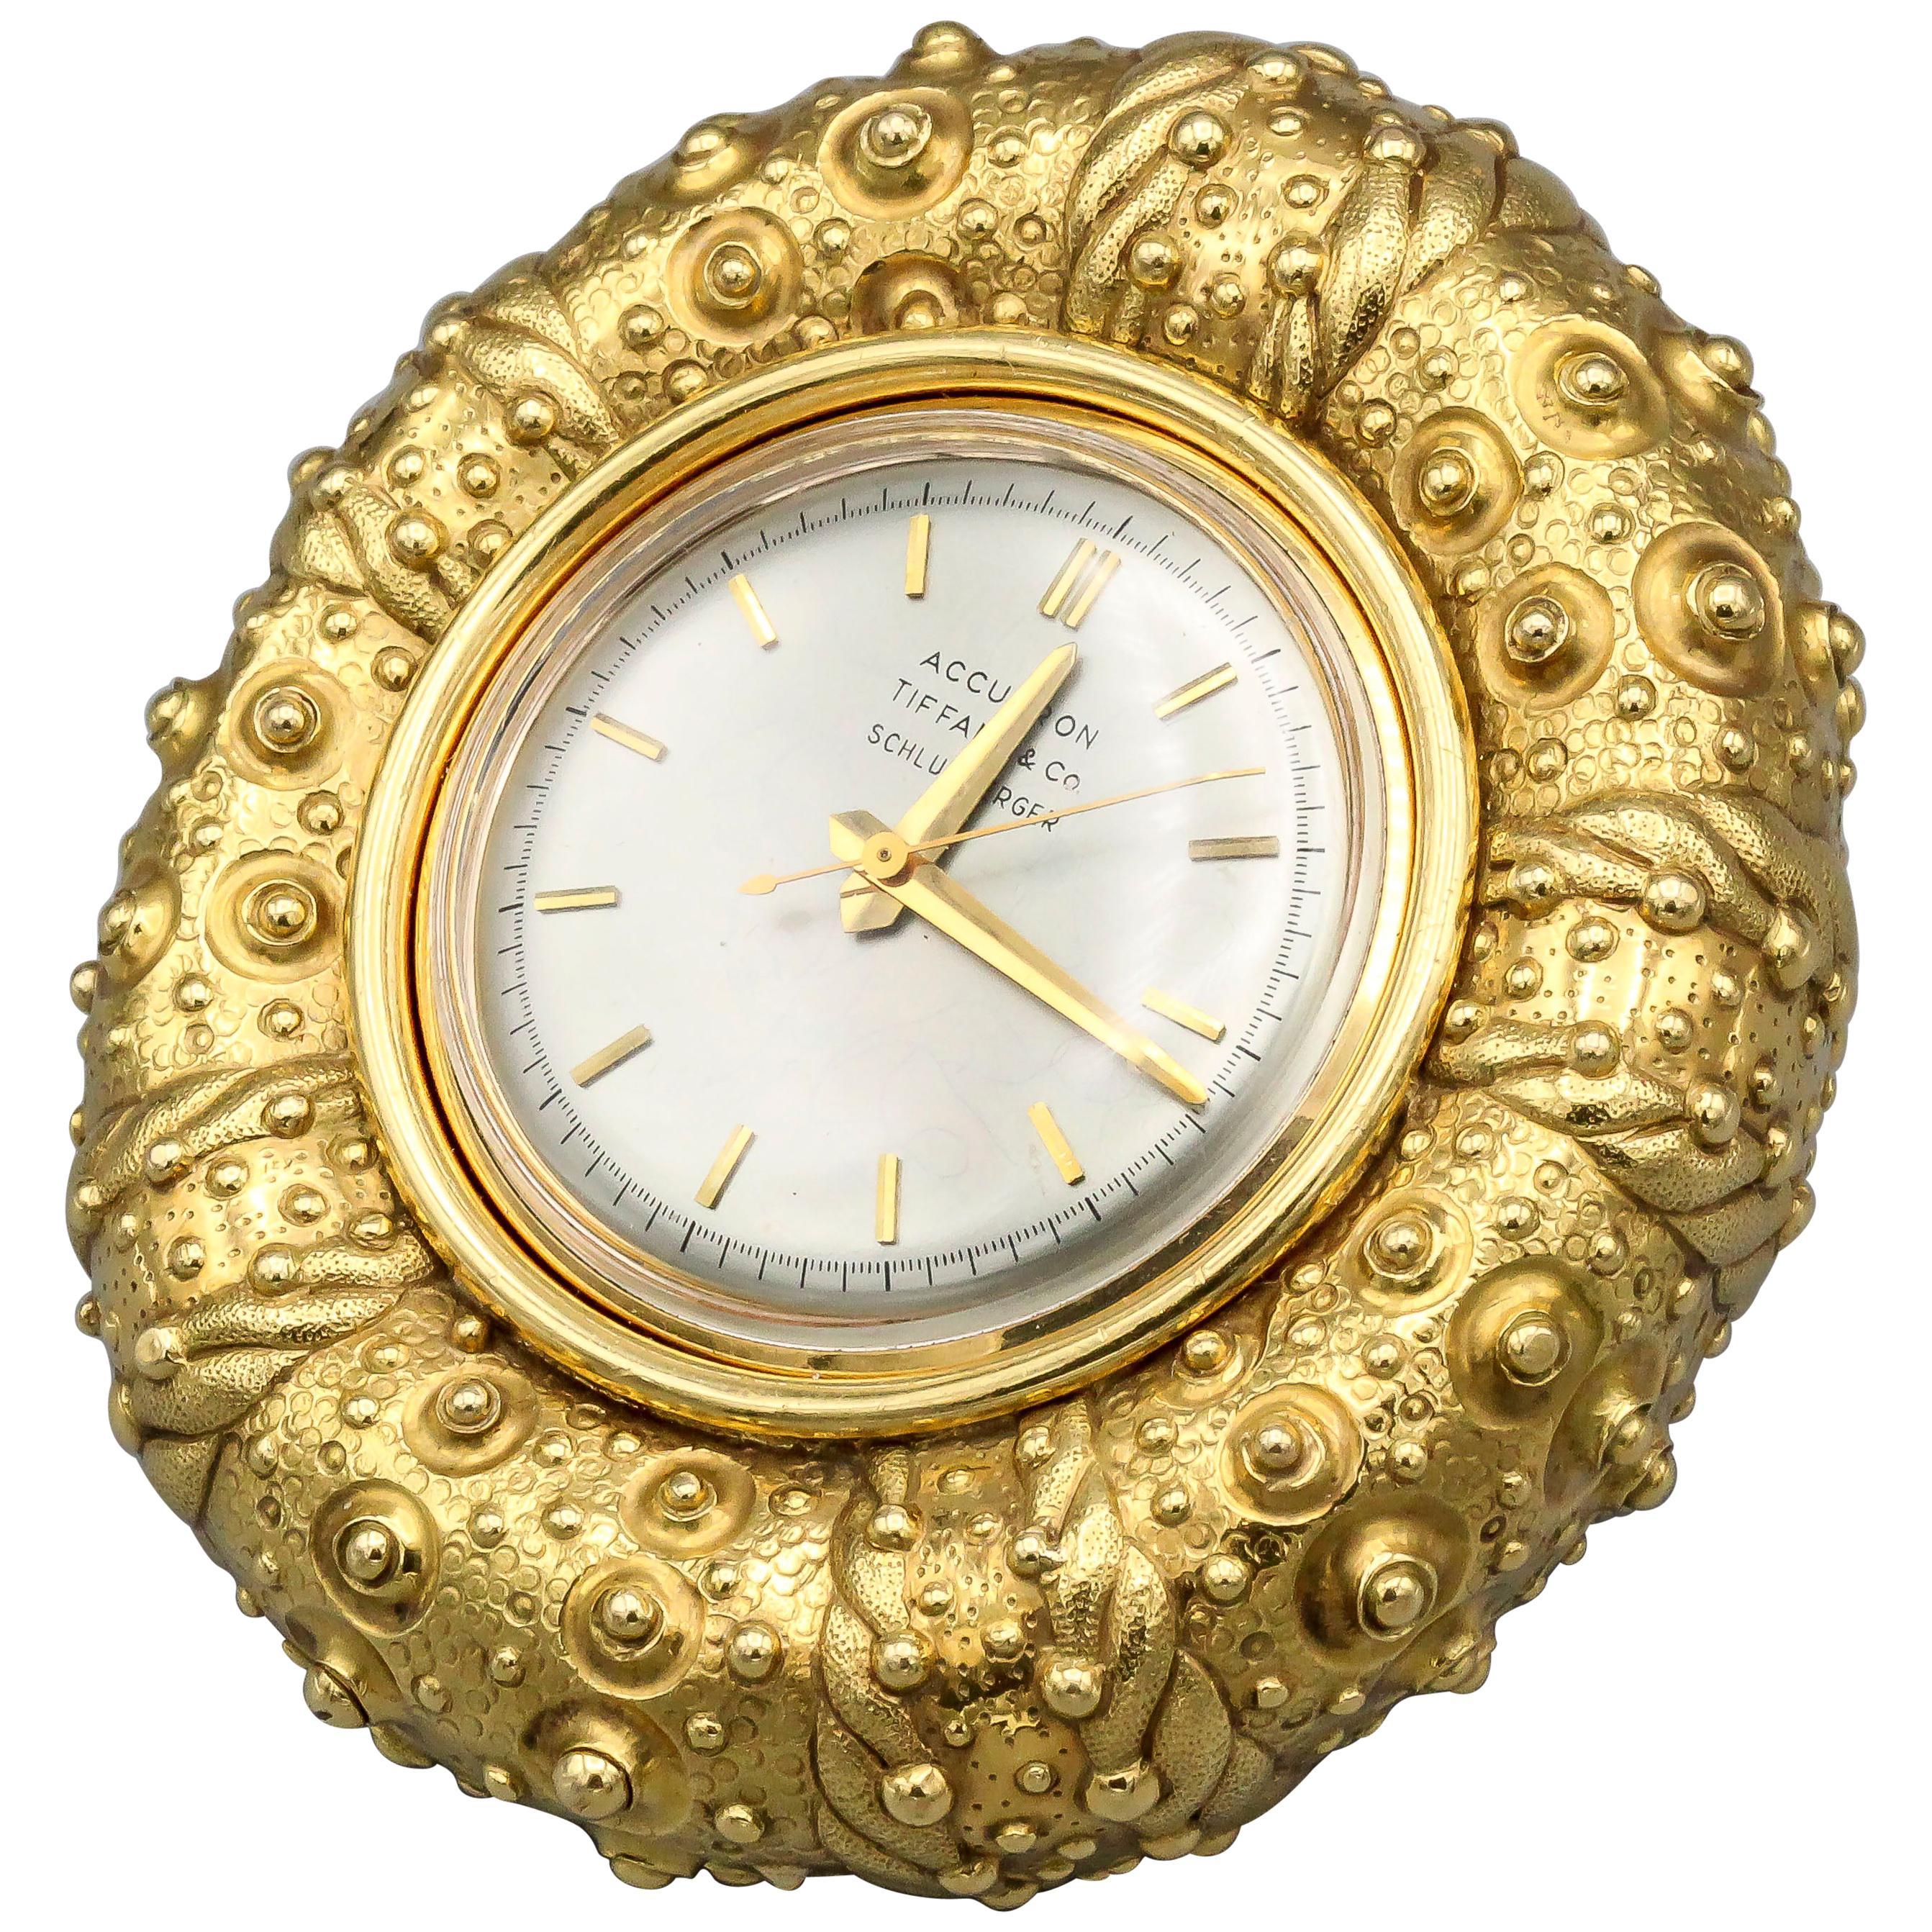 Tiffany & Co. Schlumberger 18 Karat Gold Sea Urchin Clock